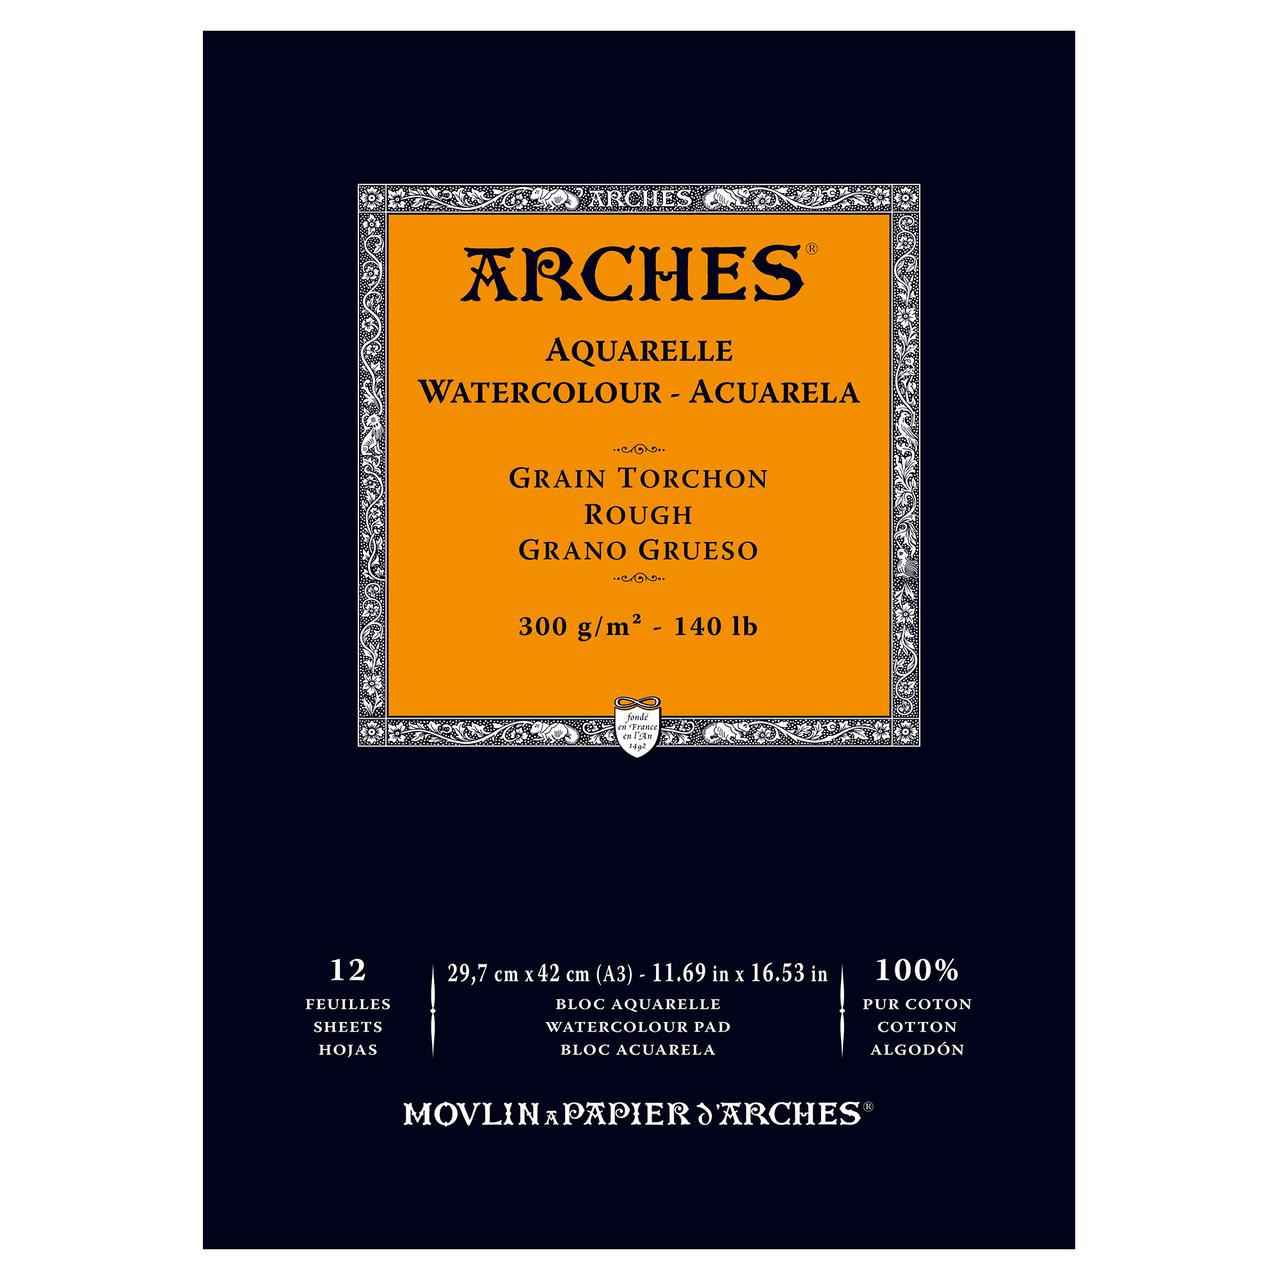 ARCHES PAD 140# ROUGH 11.7X16.5